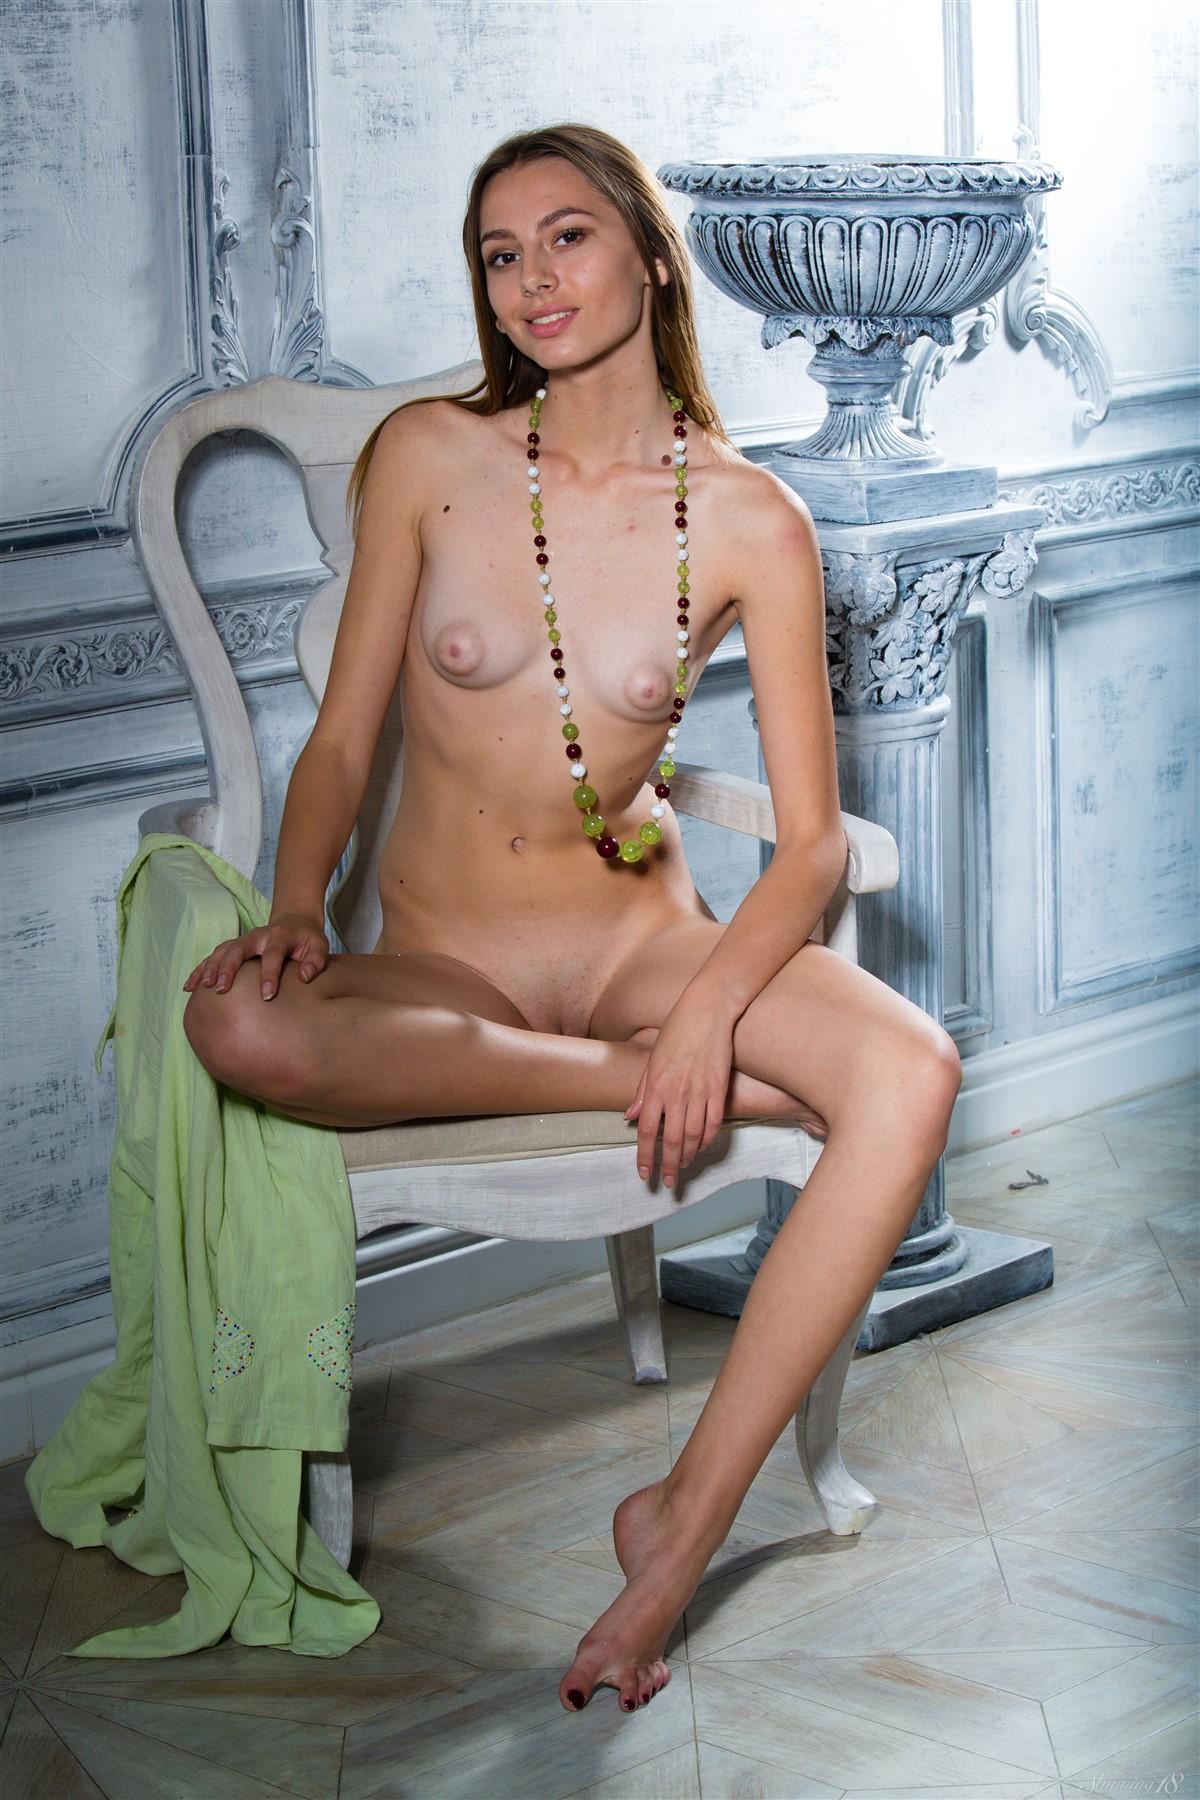 31470_Stunning_Favorite_Beads_Sally_high_0064_123_424lo.jpg